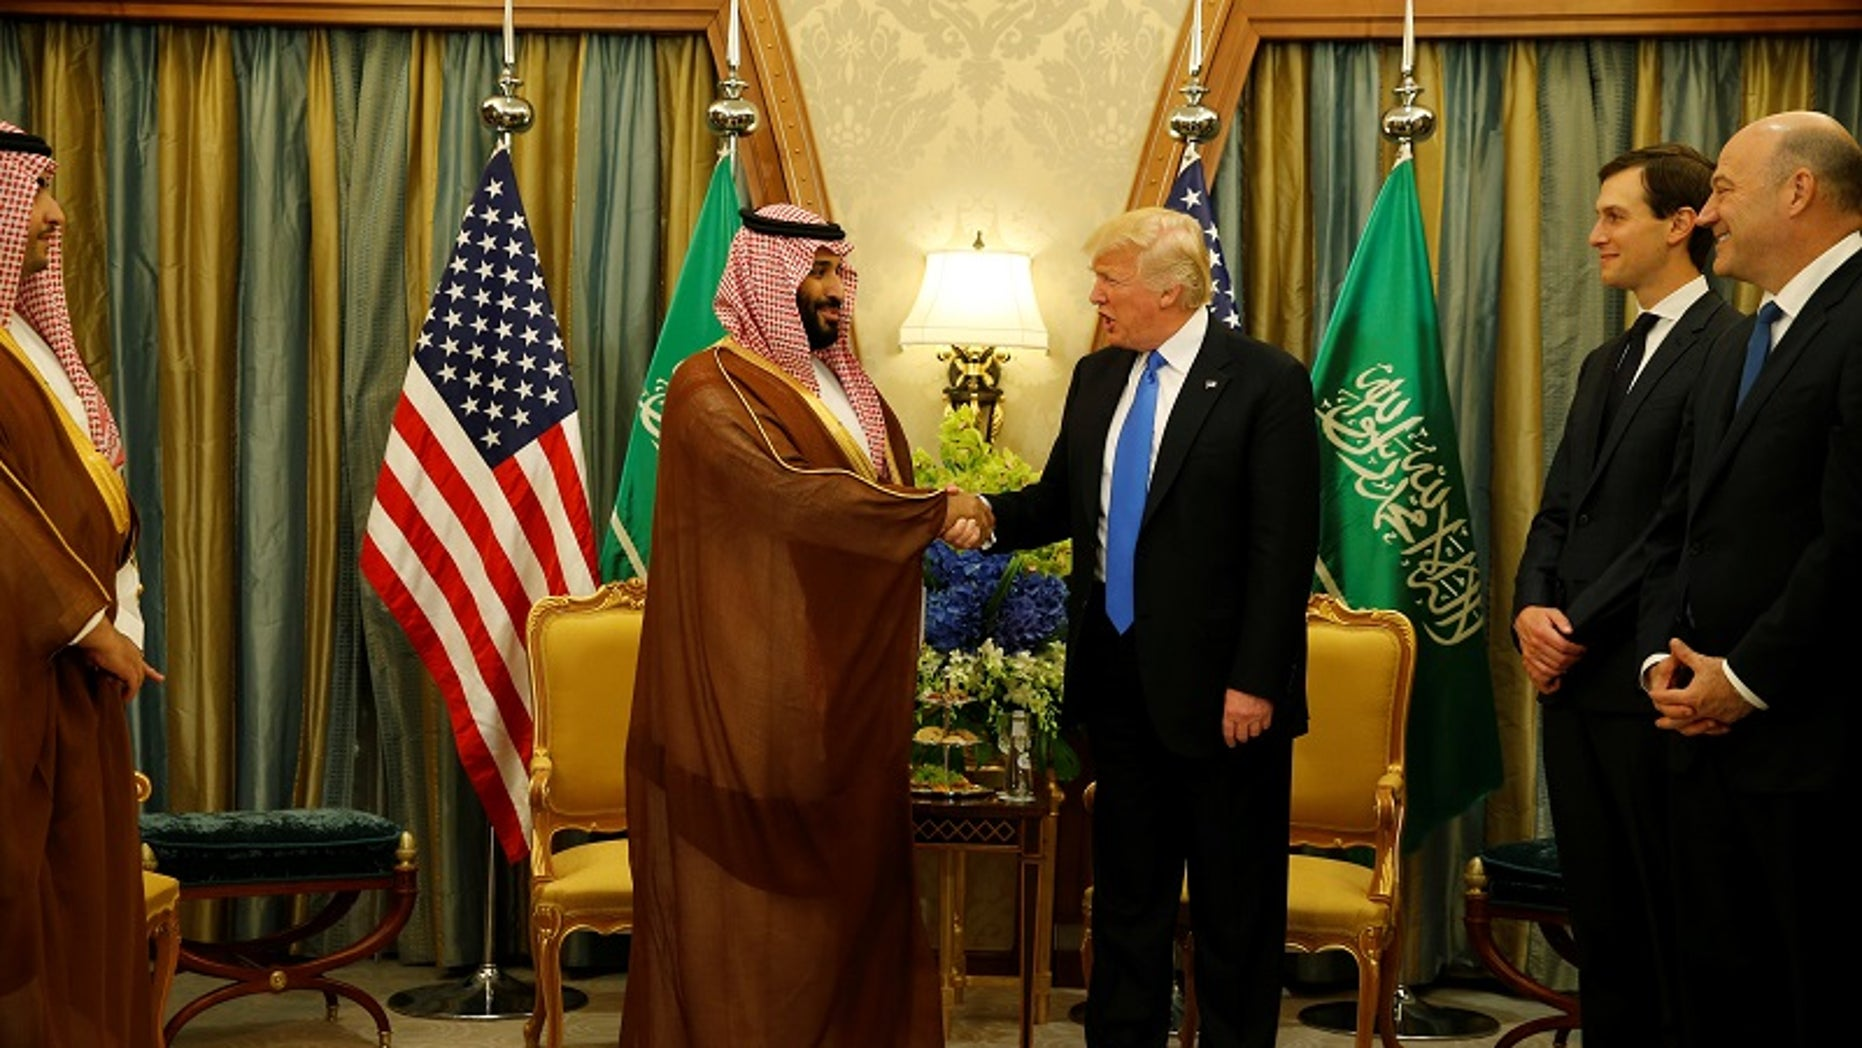 FILE -- President Donald Trump meets with Saudi Arabia's Deputy Crown Prince and Minister of Defense Mohammed bin Salman (center L) at the Ritz Carlton Hotel in Riyadh, Saudi Arabia May 20, 2017.